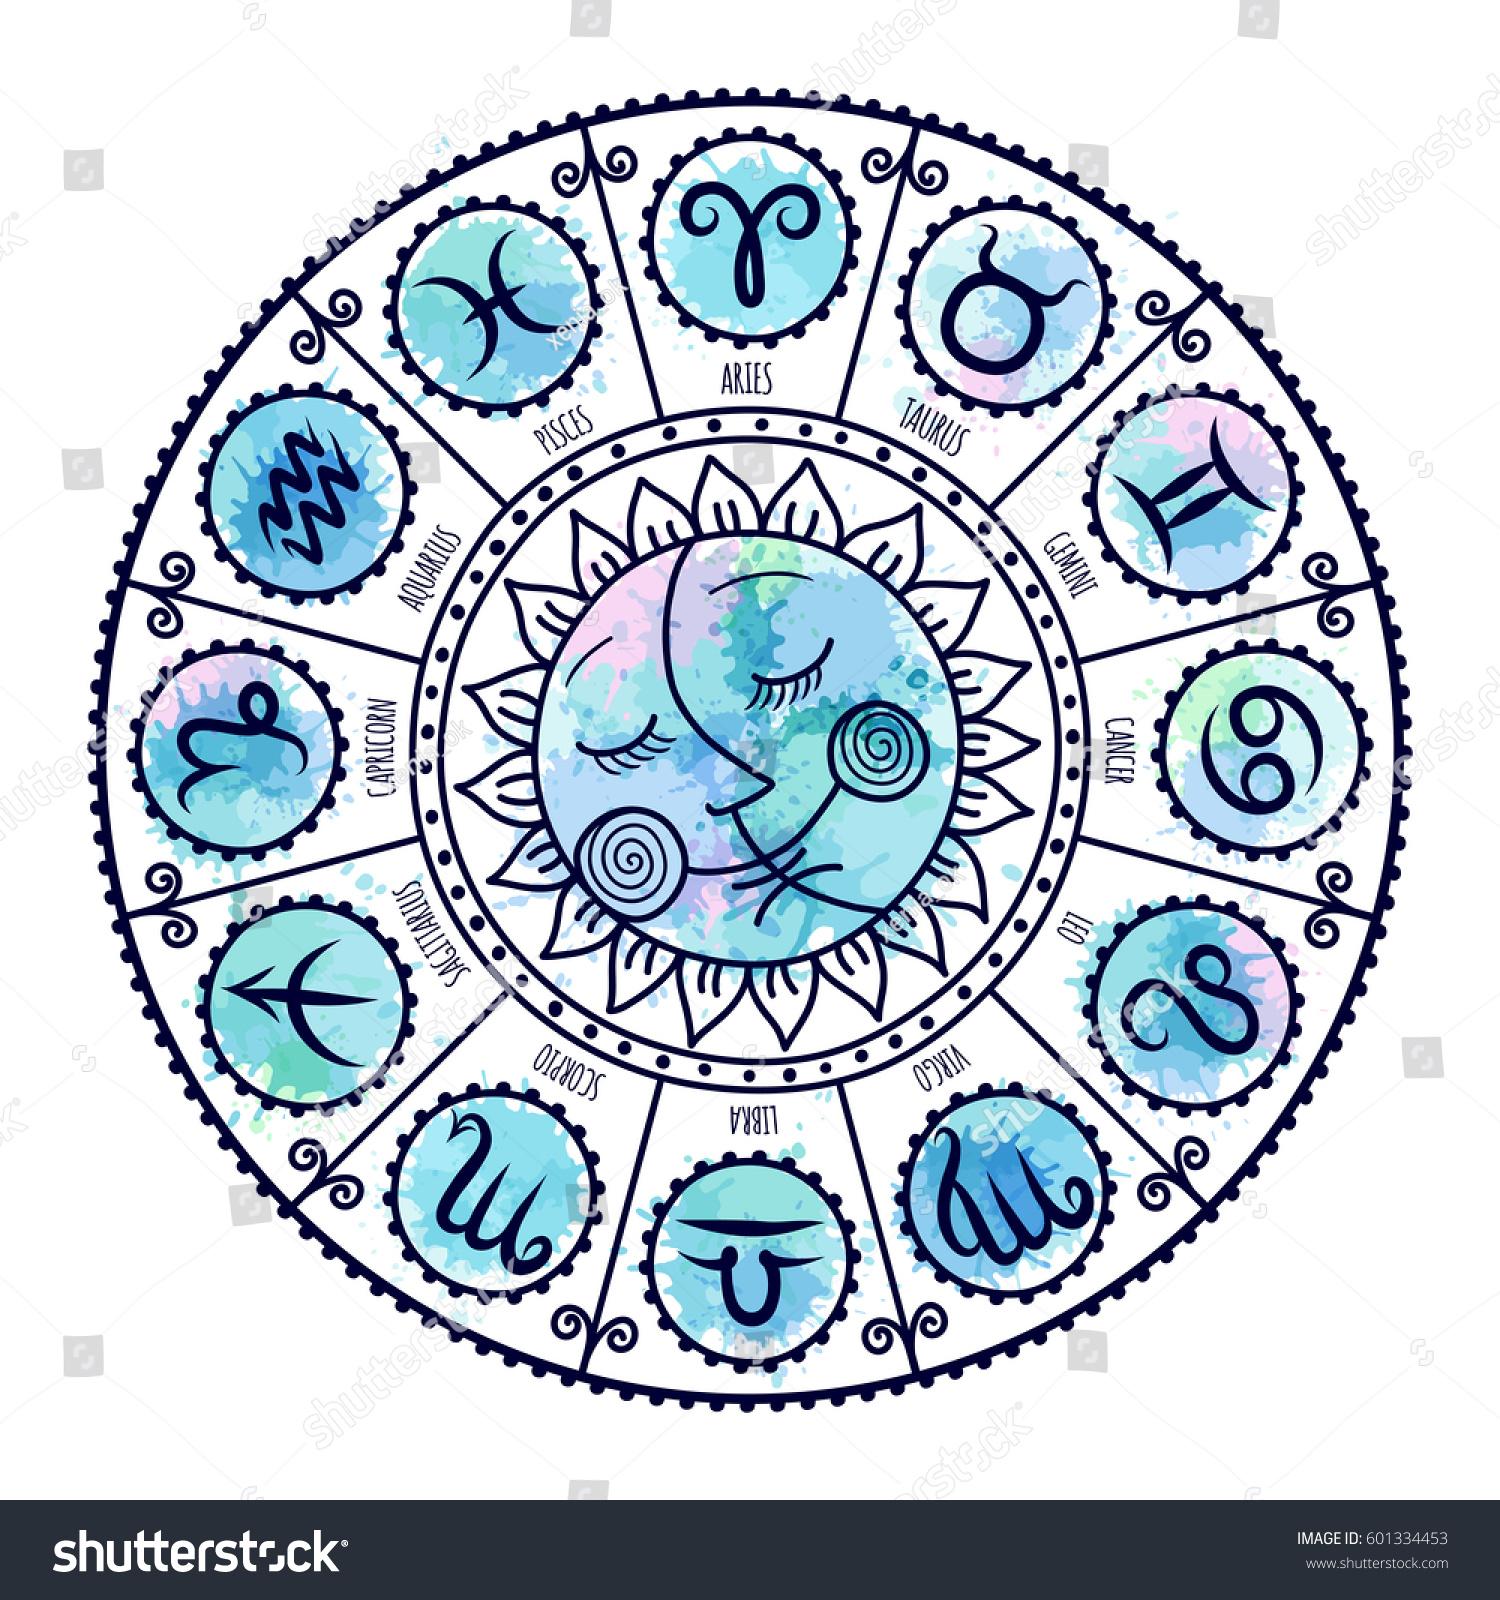 Set symbol zodiac sign zodiac icons stock vector 601334453 set of symbol zodiac sign zodiac icons freehand drawing buycottarizona